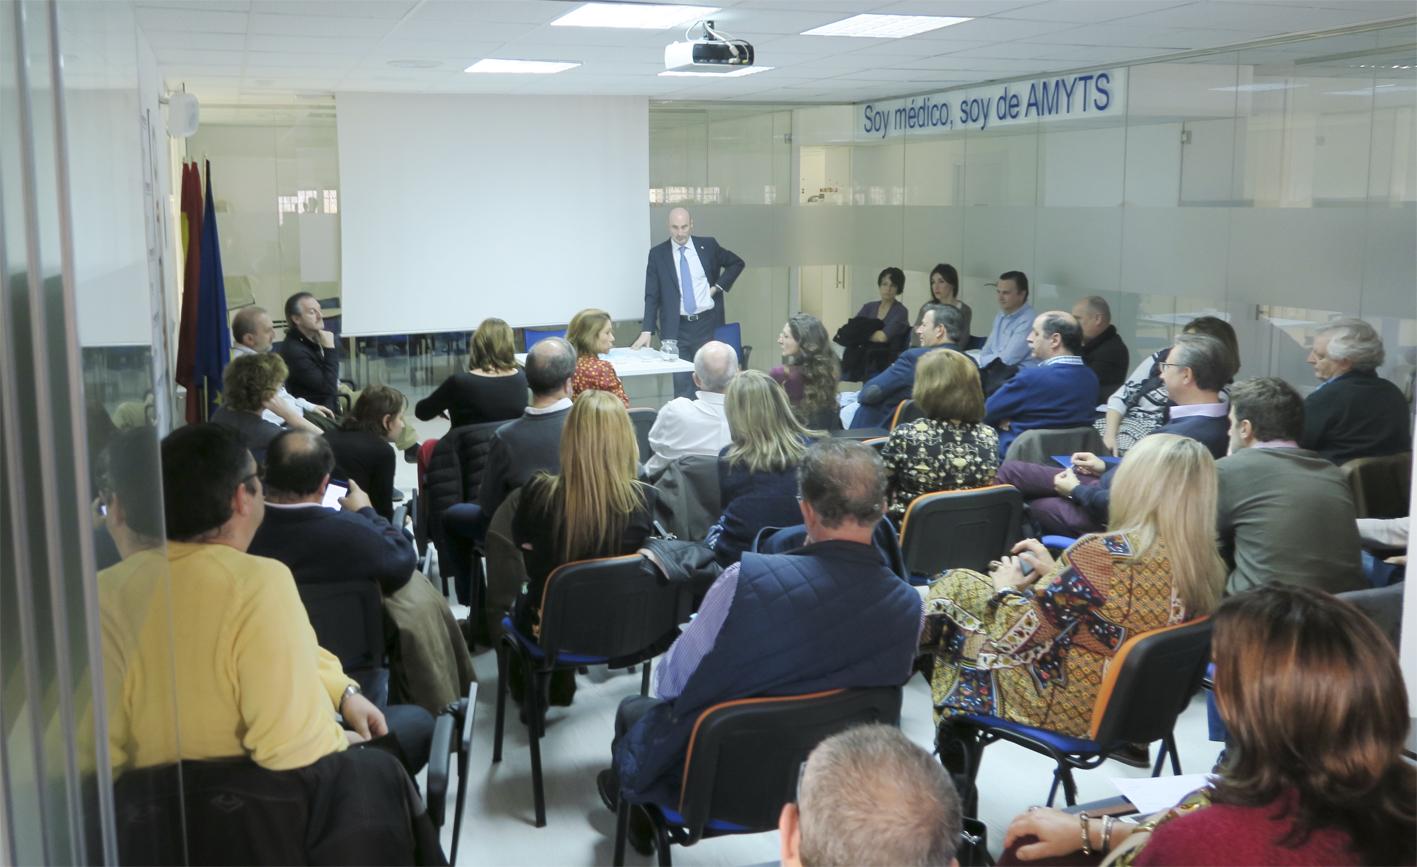 152 Asamblea General - Asistentes